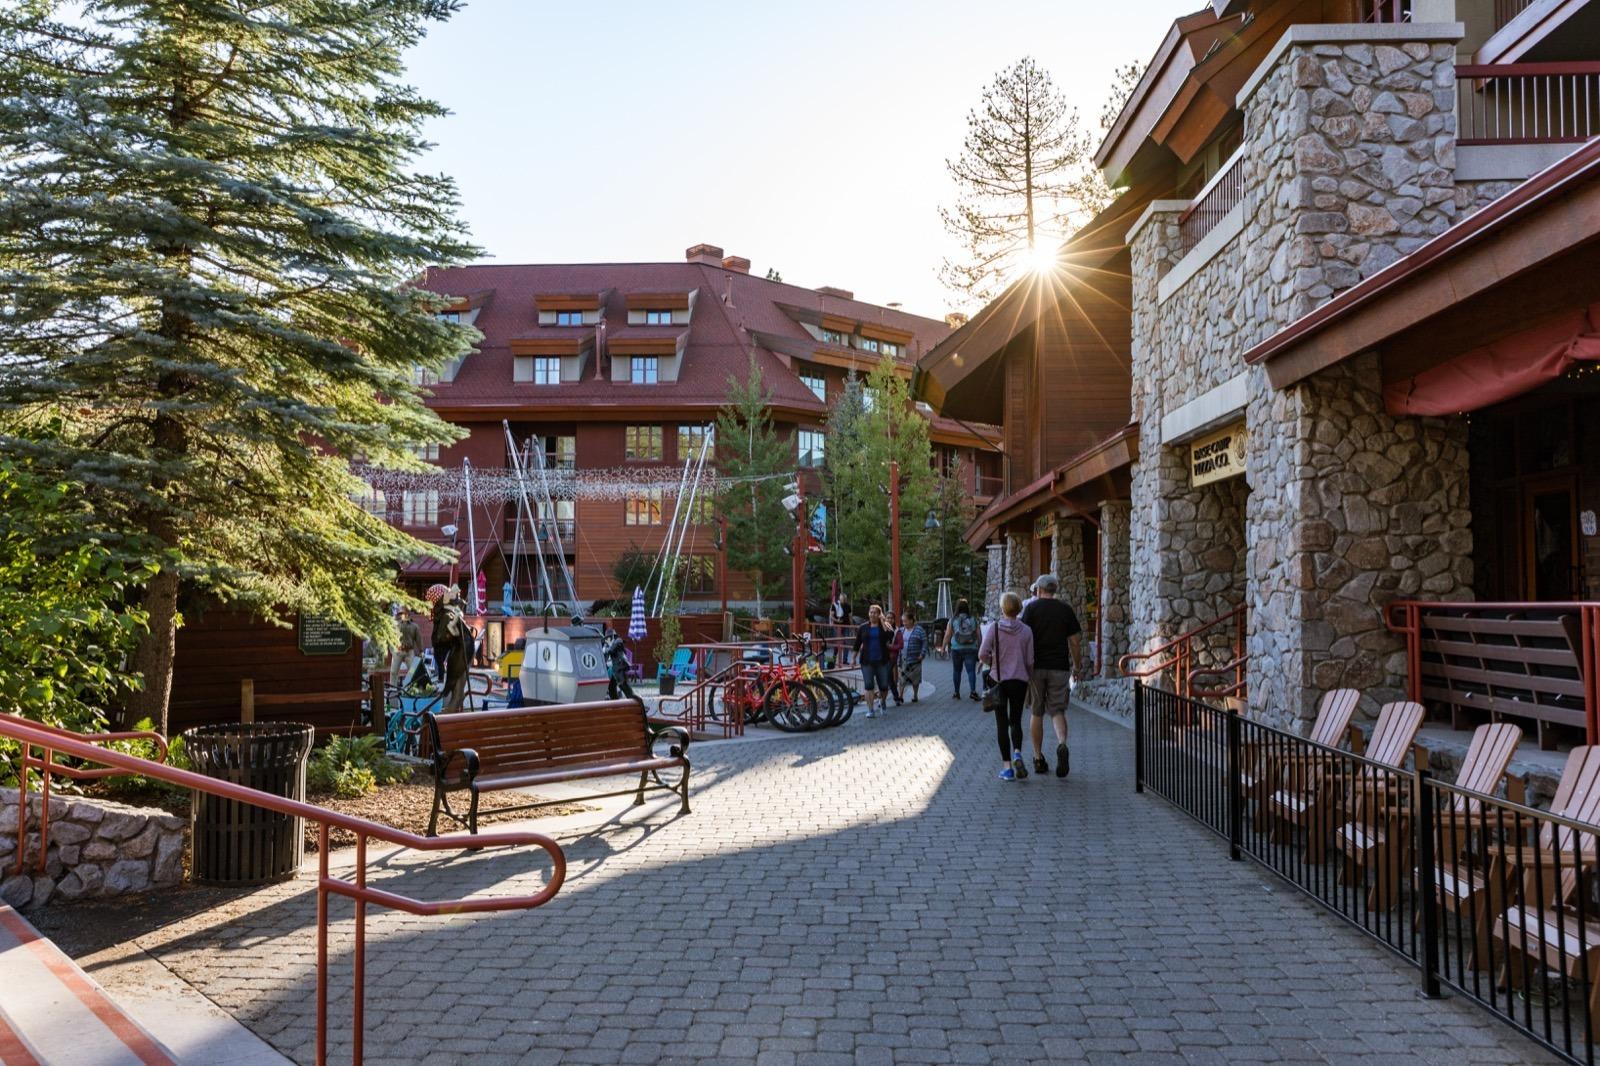 california-high-sierra-south-lake-tahoe-heavenly-village-shops-1